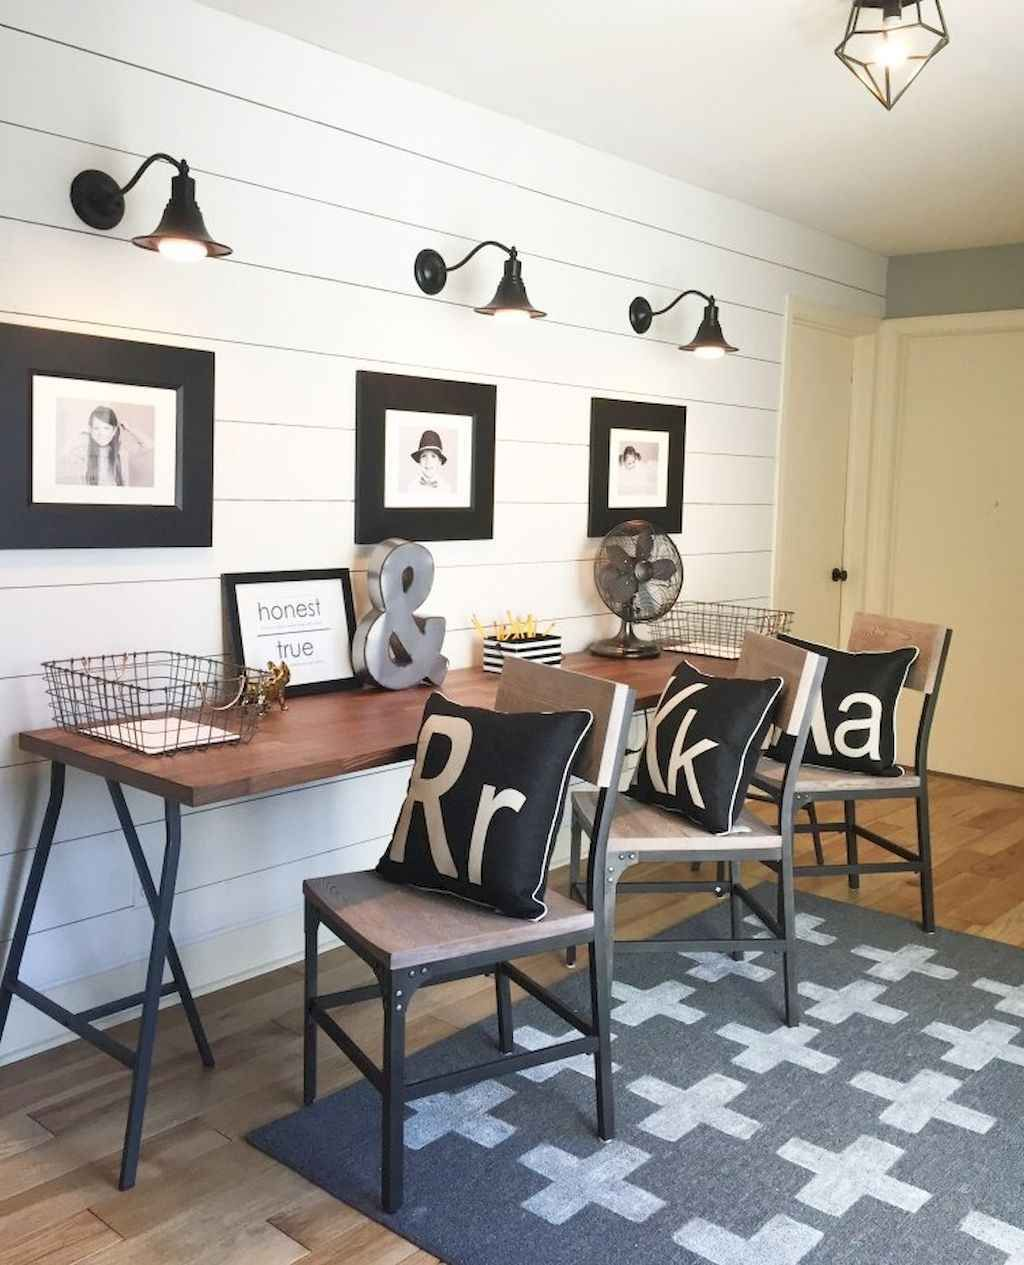 Wondrous 40 Easy Diy Farmhouse Desk Decor Ideas On A Budget 8 In Download Free Architecture Designs Intelgarnamadebymaigaardcom